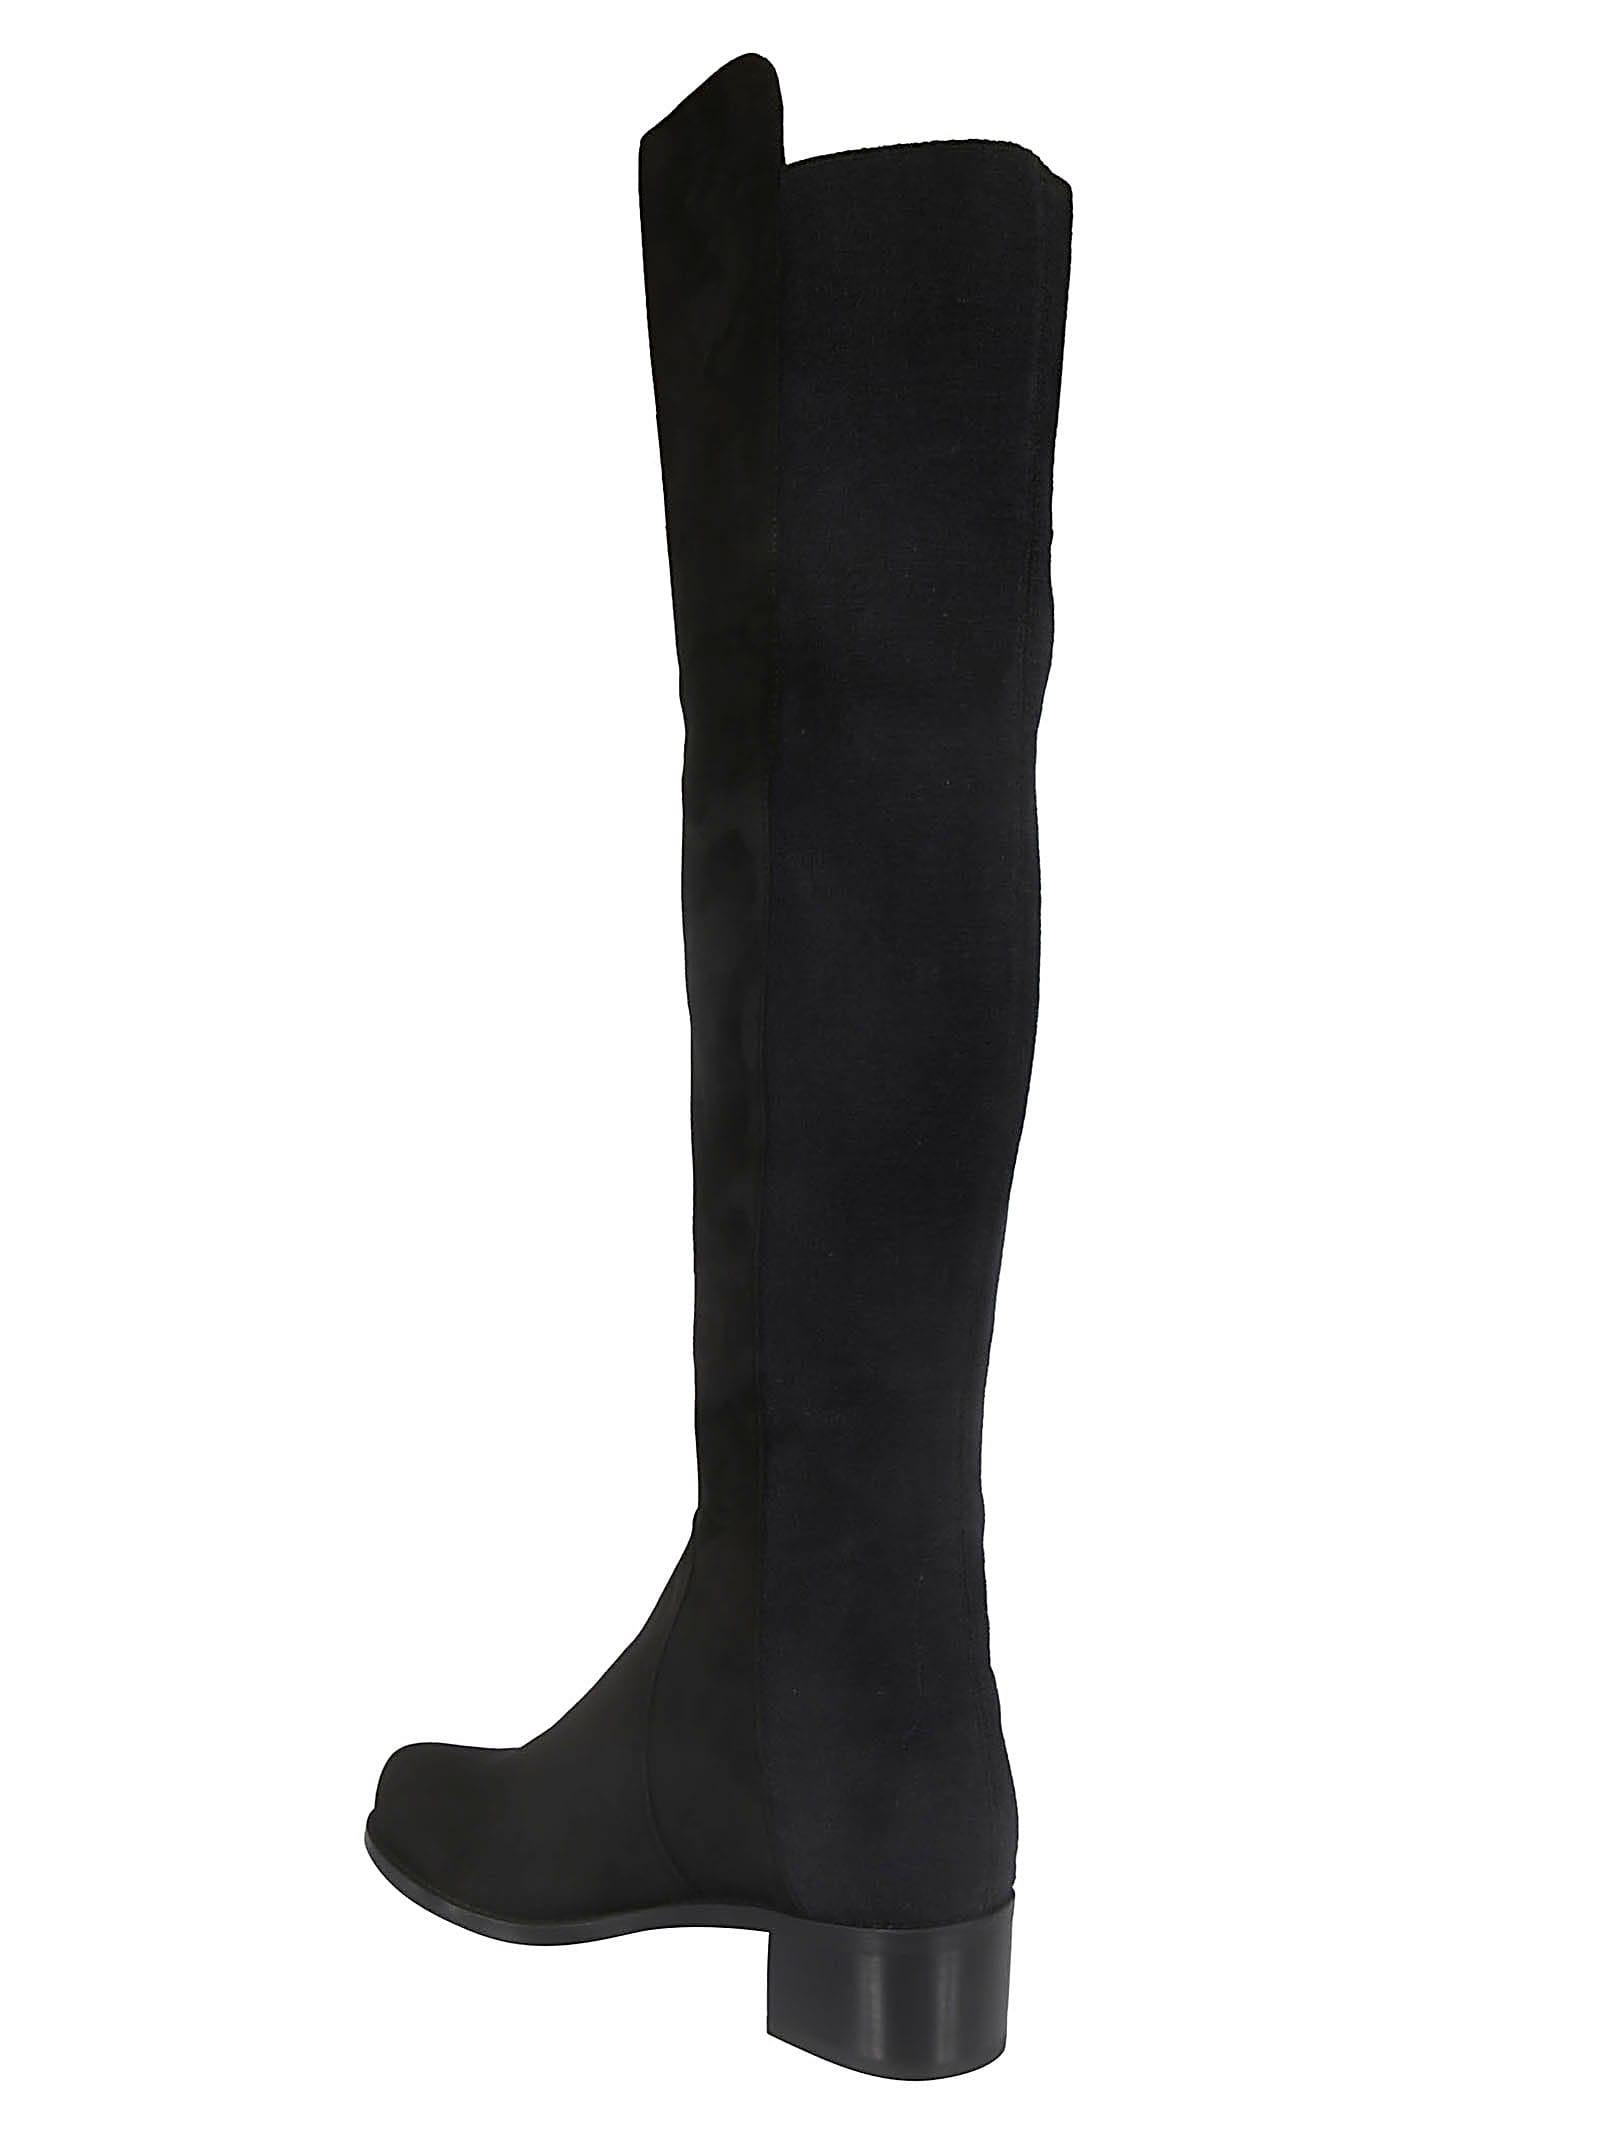 shades of best price footwear Stuart Weitzman Stuart Weitzman Reserve Boots - Black - 11146453 ...